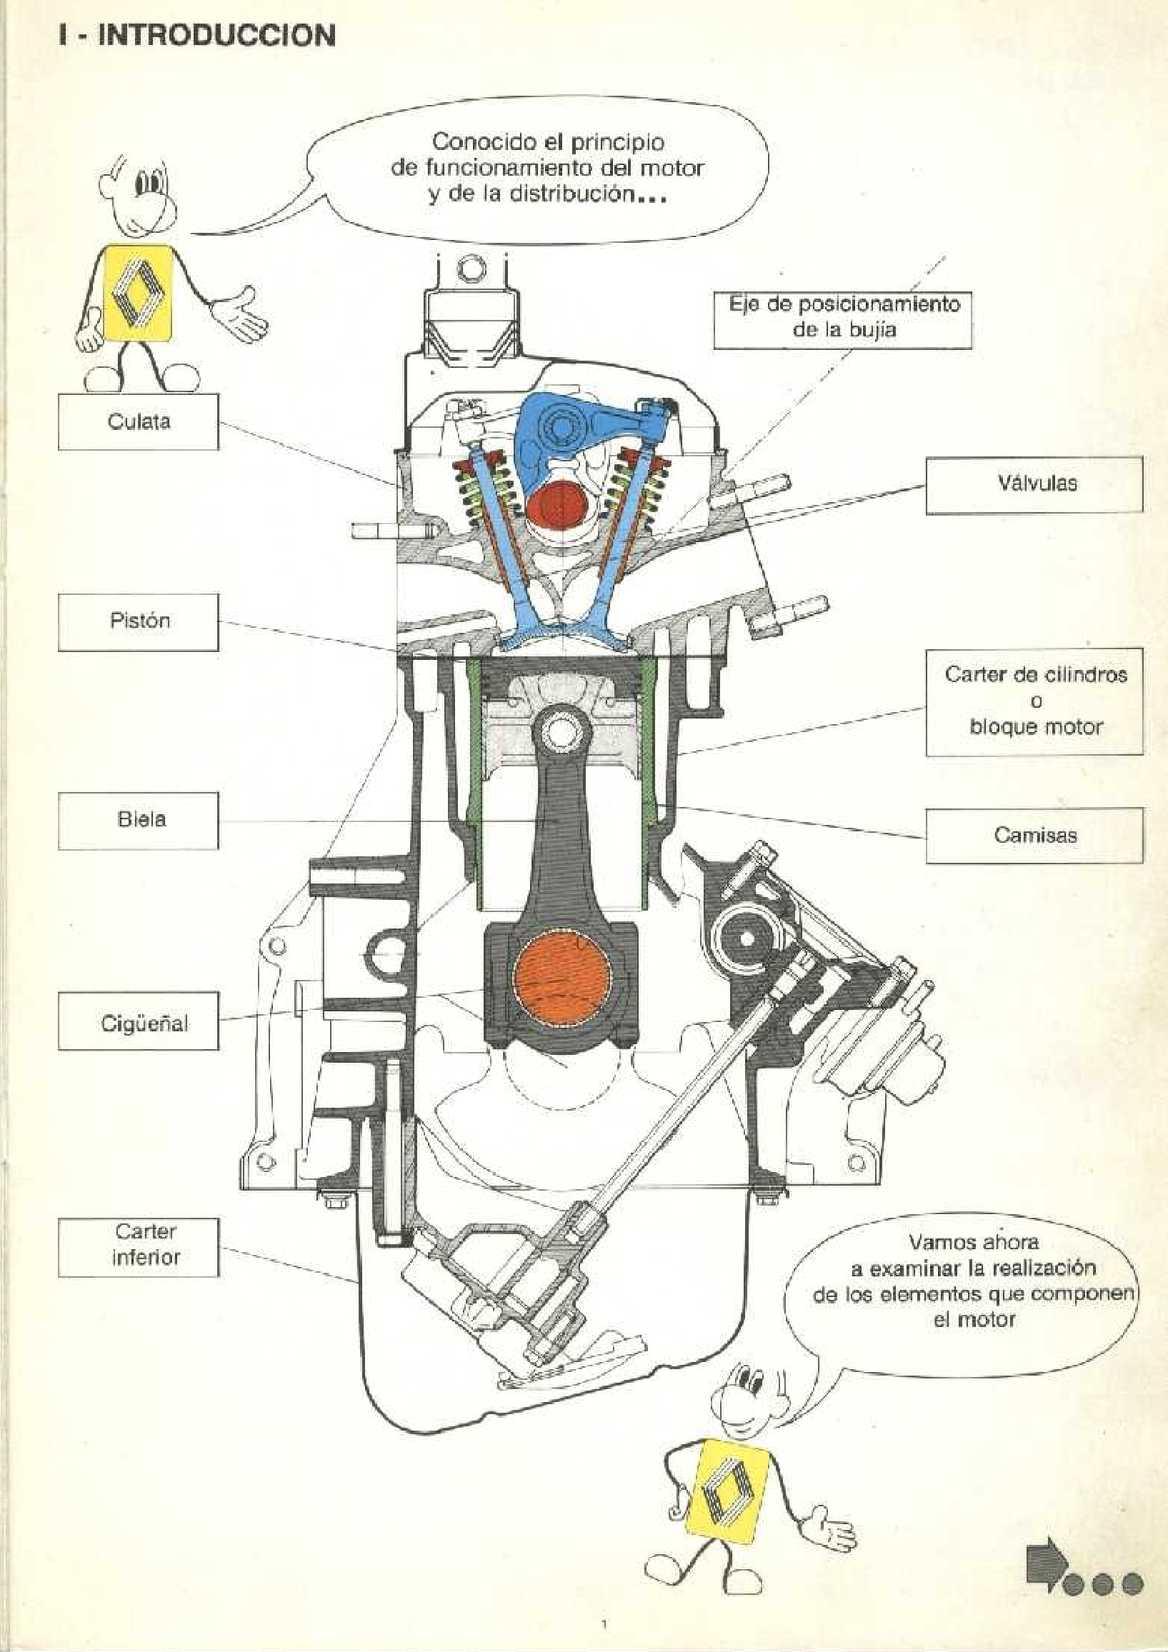 Básico Motor 3 - Distribución